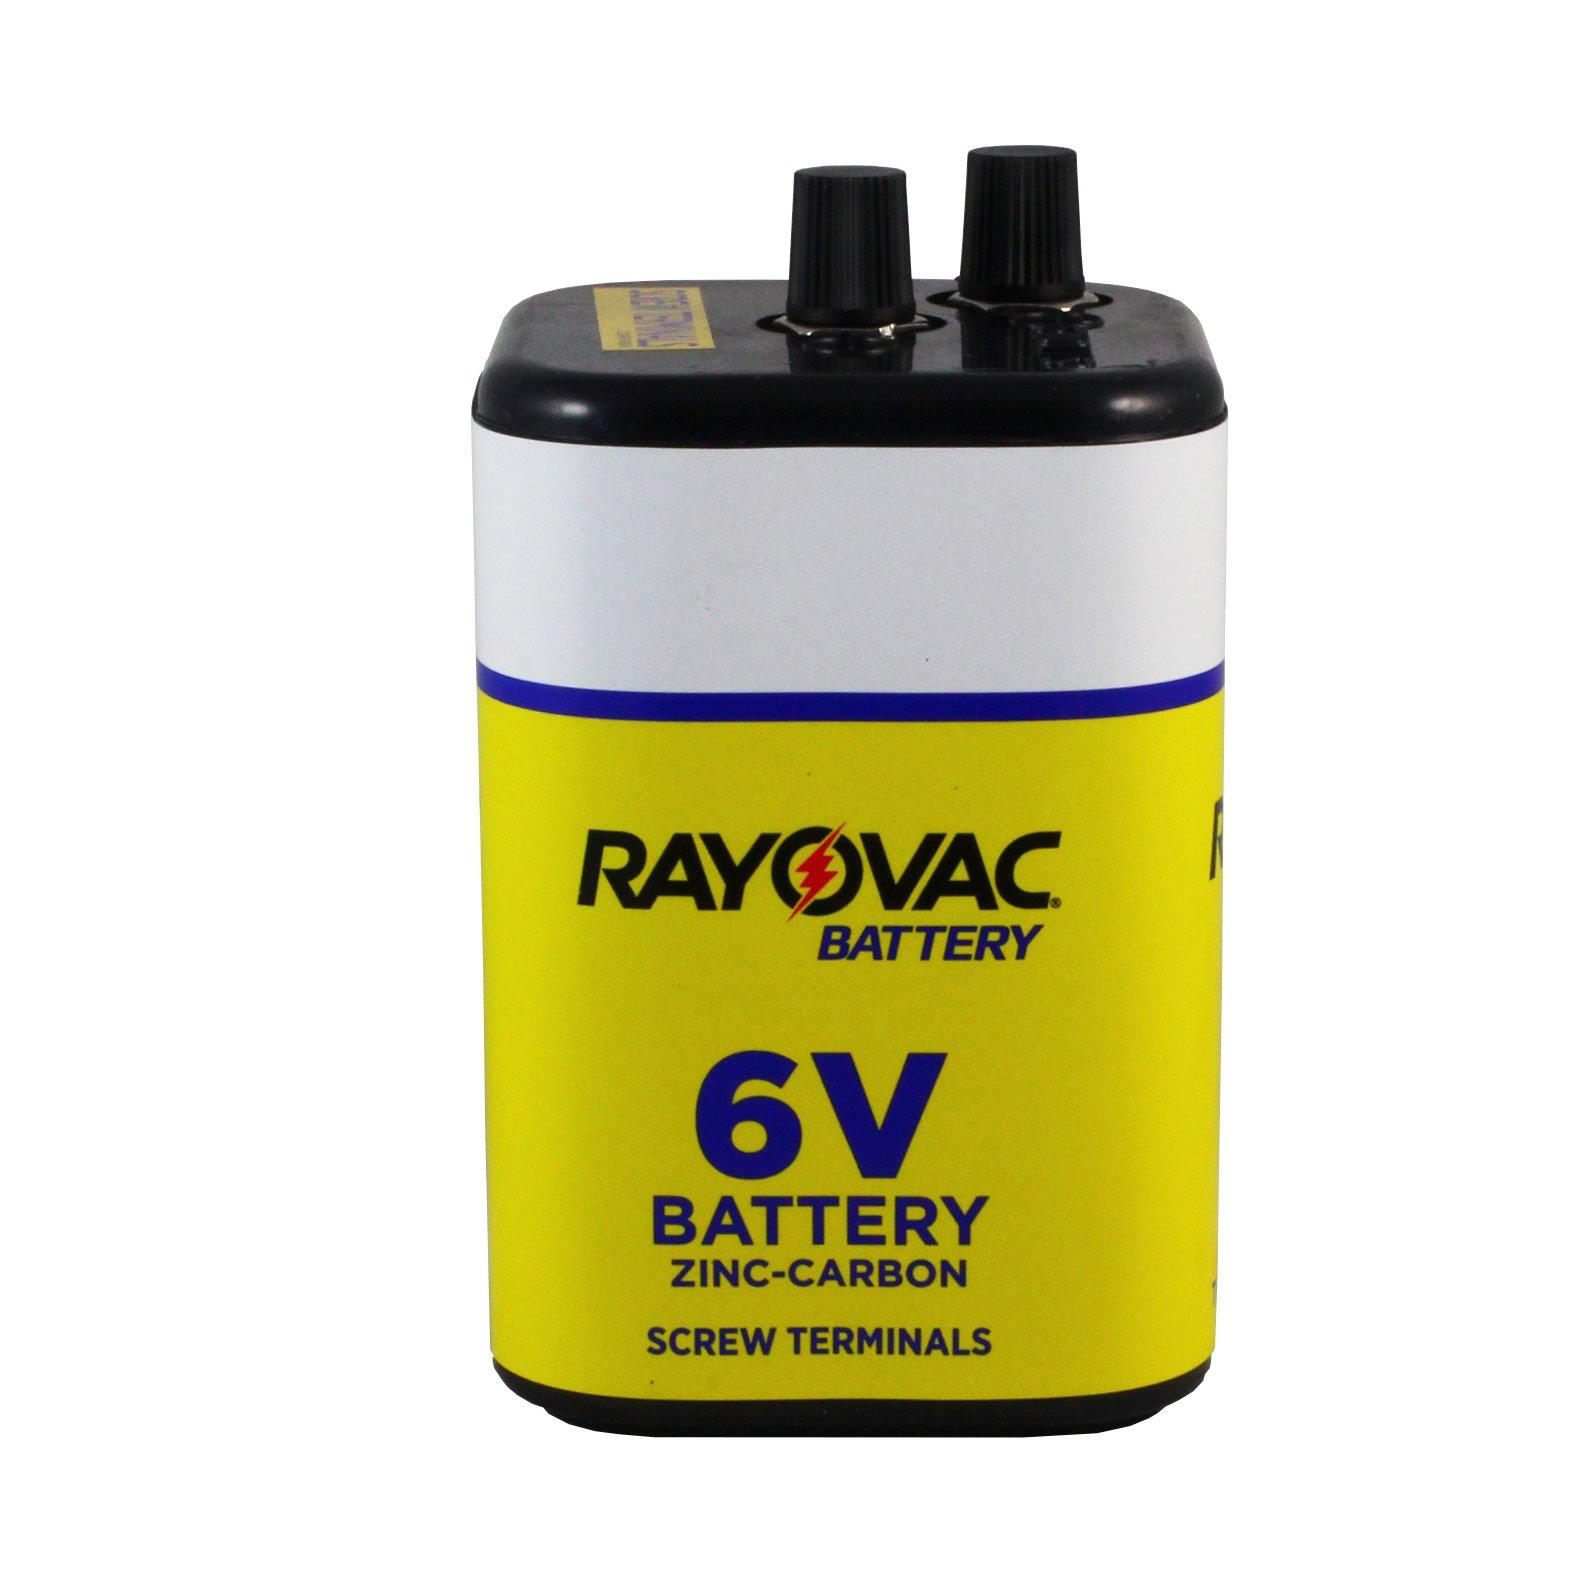 Rayovac Screw Terminal Lantern Battery Free Shipping